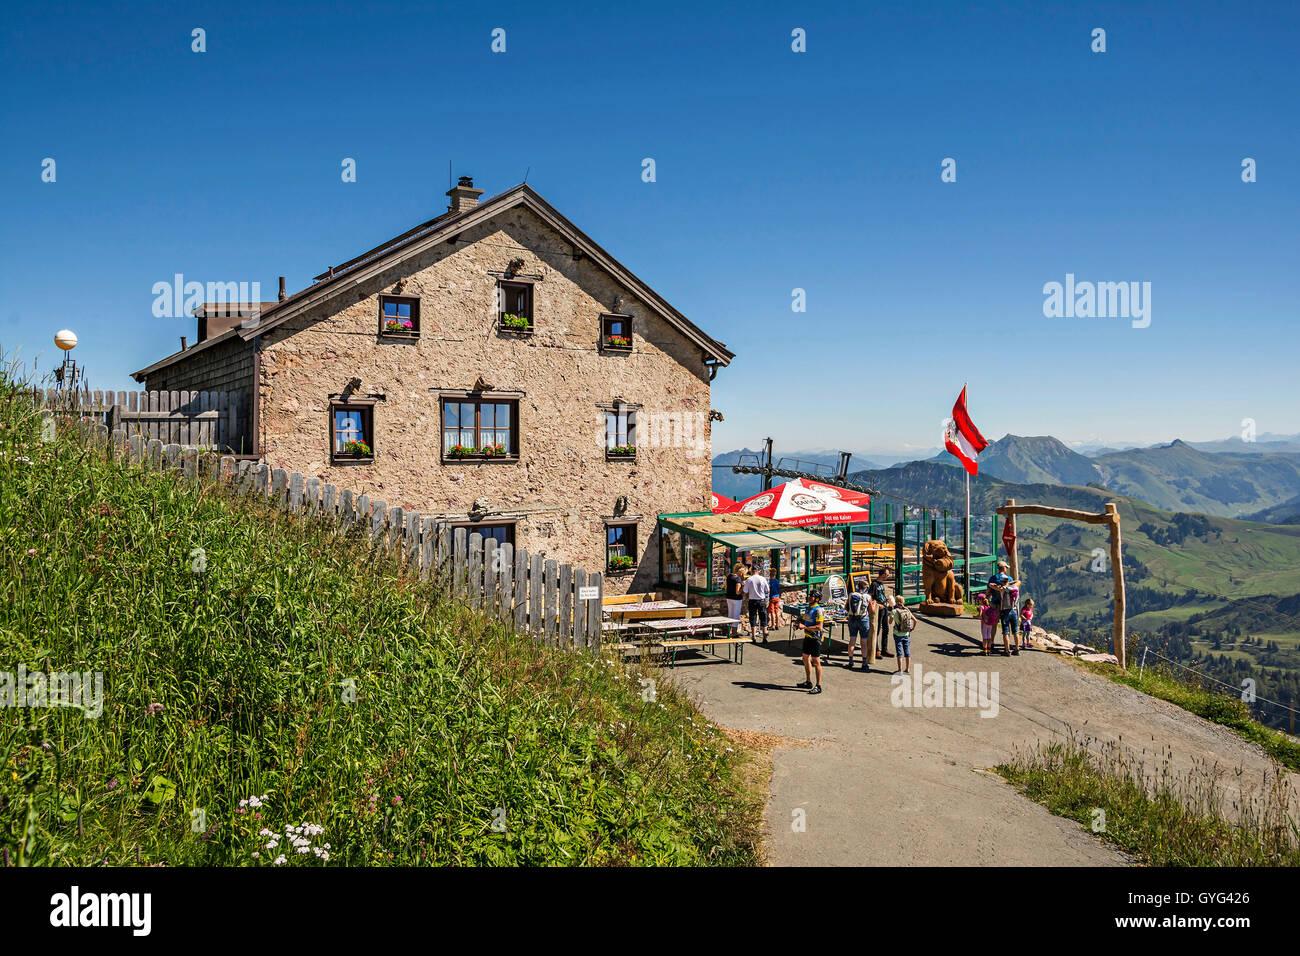 Cottage at high altitude at Kitzbuhel peak, popular ski resort and summer destination for hiking in Tirol - Stock Image